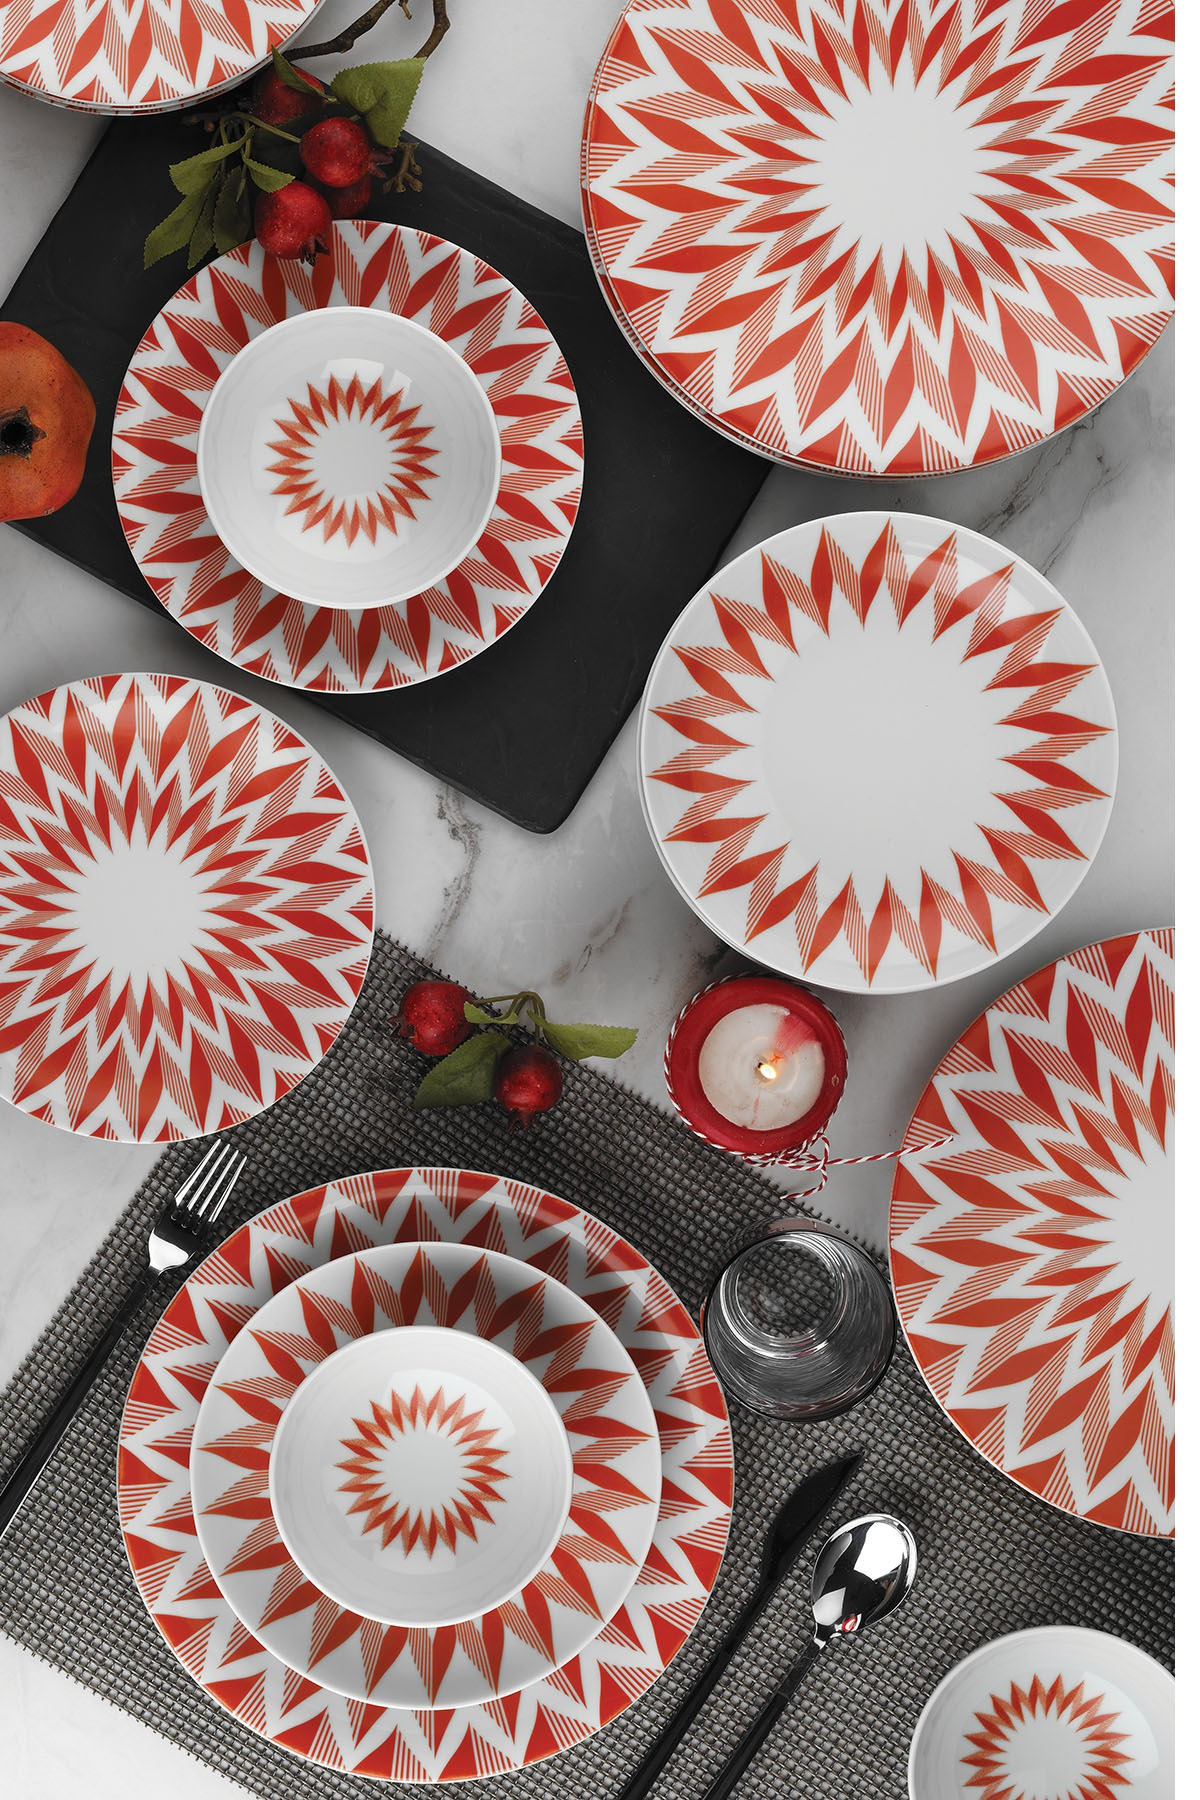 KÜTAHYA PORSELEN - Kütahya Porselen Nano 24 Parça Yemek Seti 885144